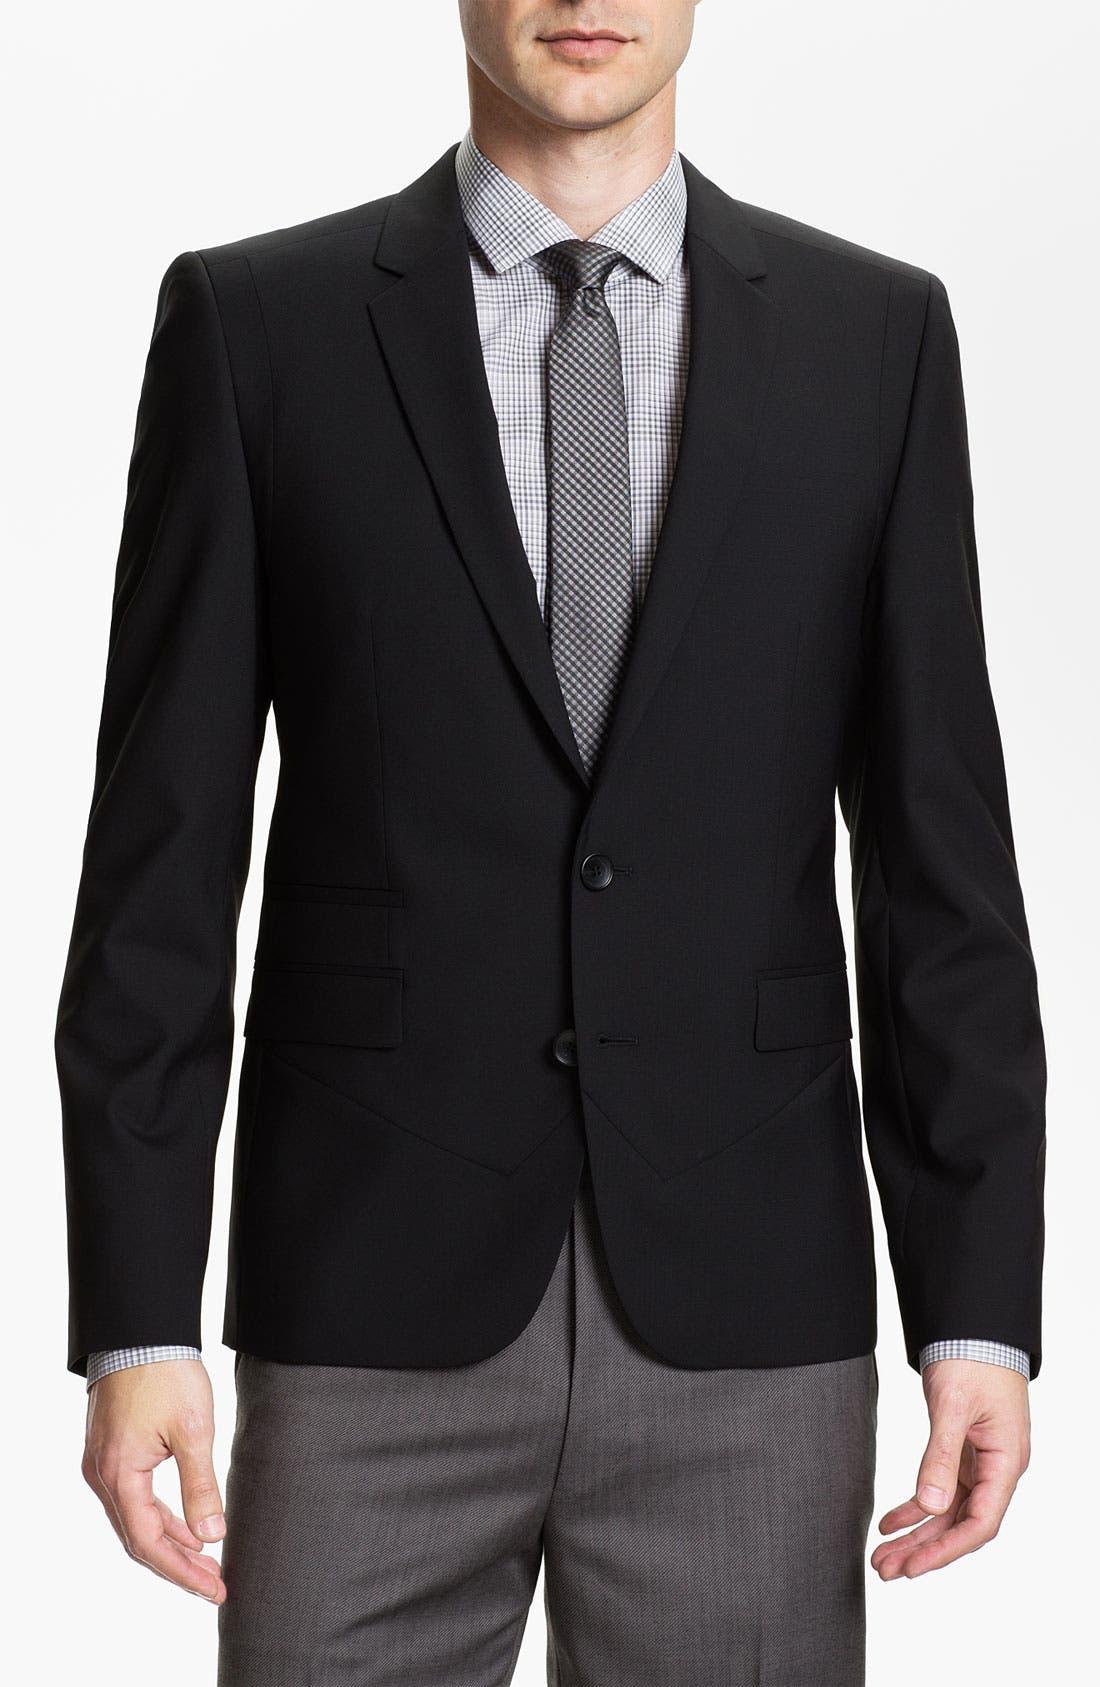 Alternate Image 1 Selected - HUGO 'Arwis' Trim Fit Stretch Wool Blazer